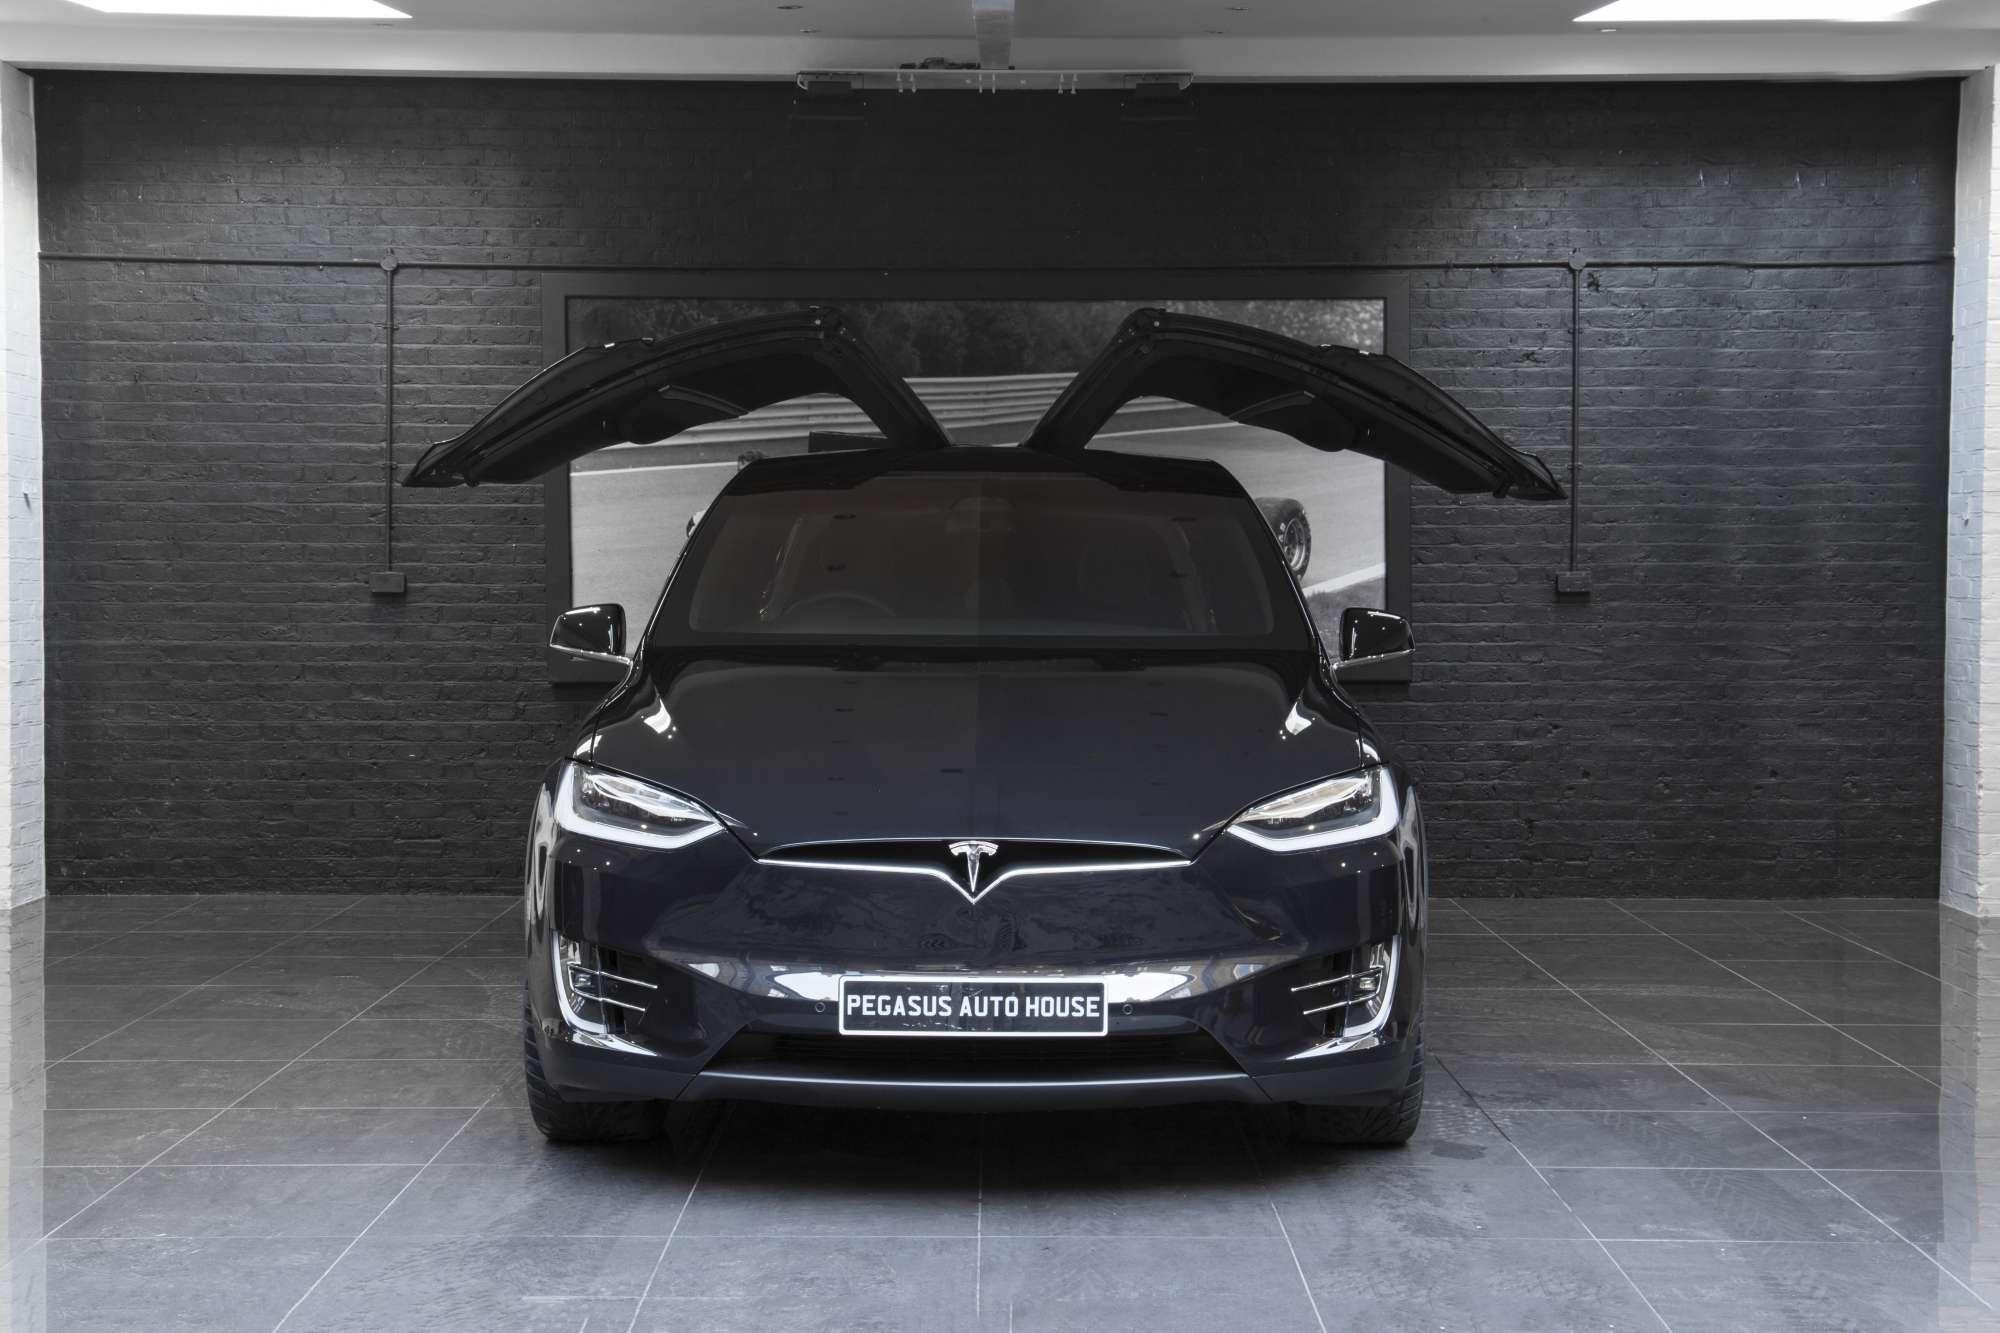 Tesla Model X 100d Pegasus Auto House